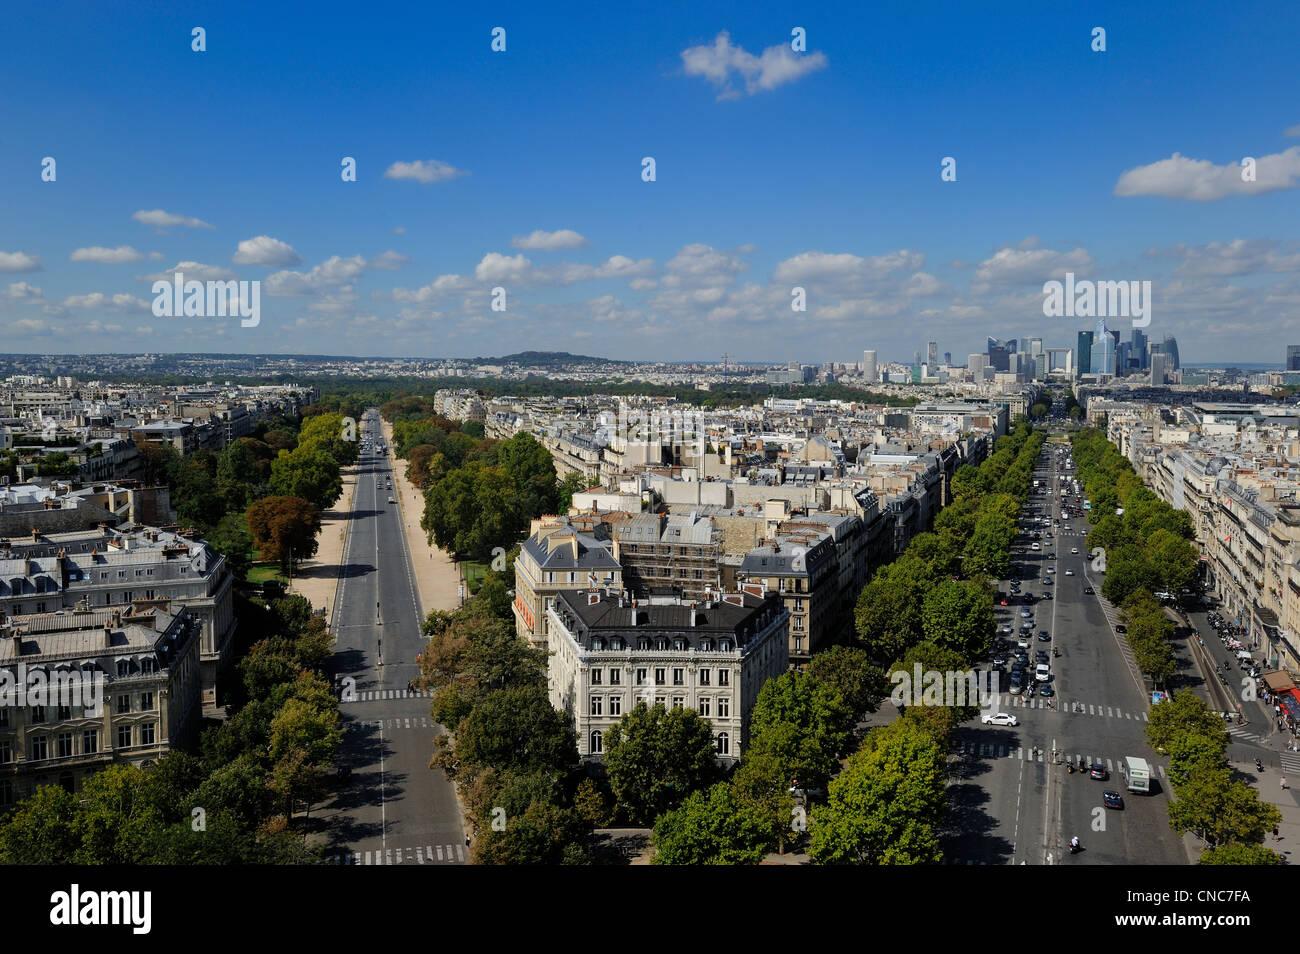 France, Paris, the royal axis from la Concorde to La Defense, avenue de la Grande Armee on the right, and the avenue - Stock Image